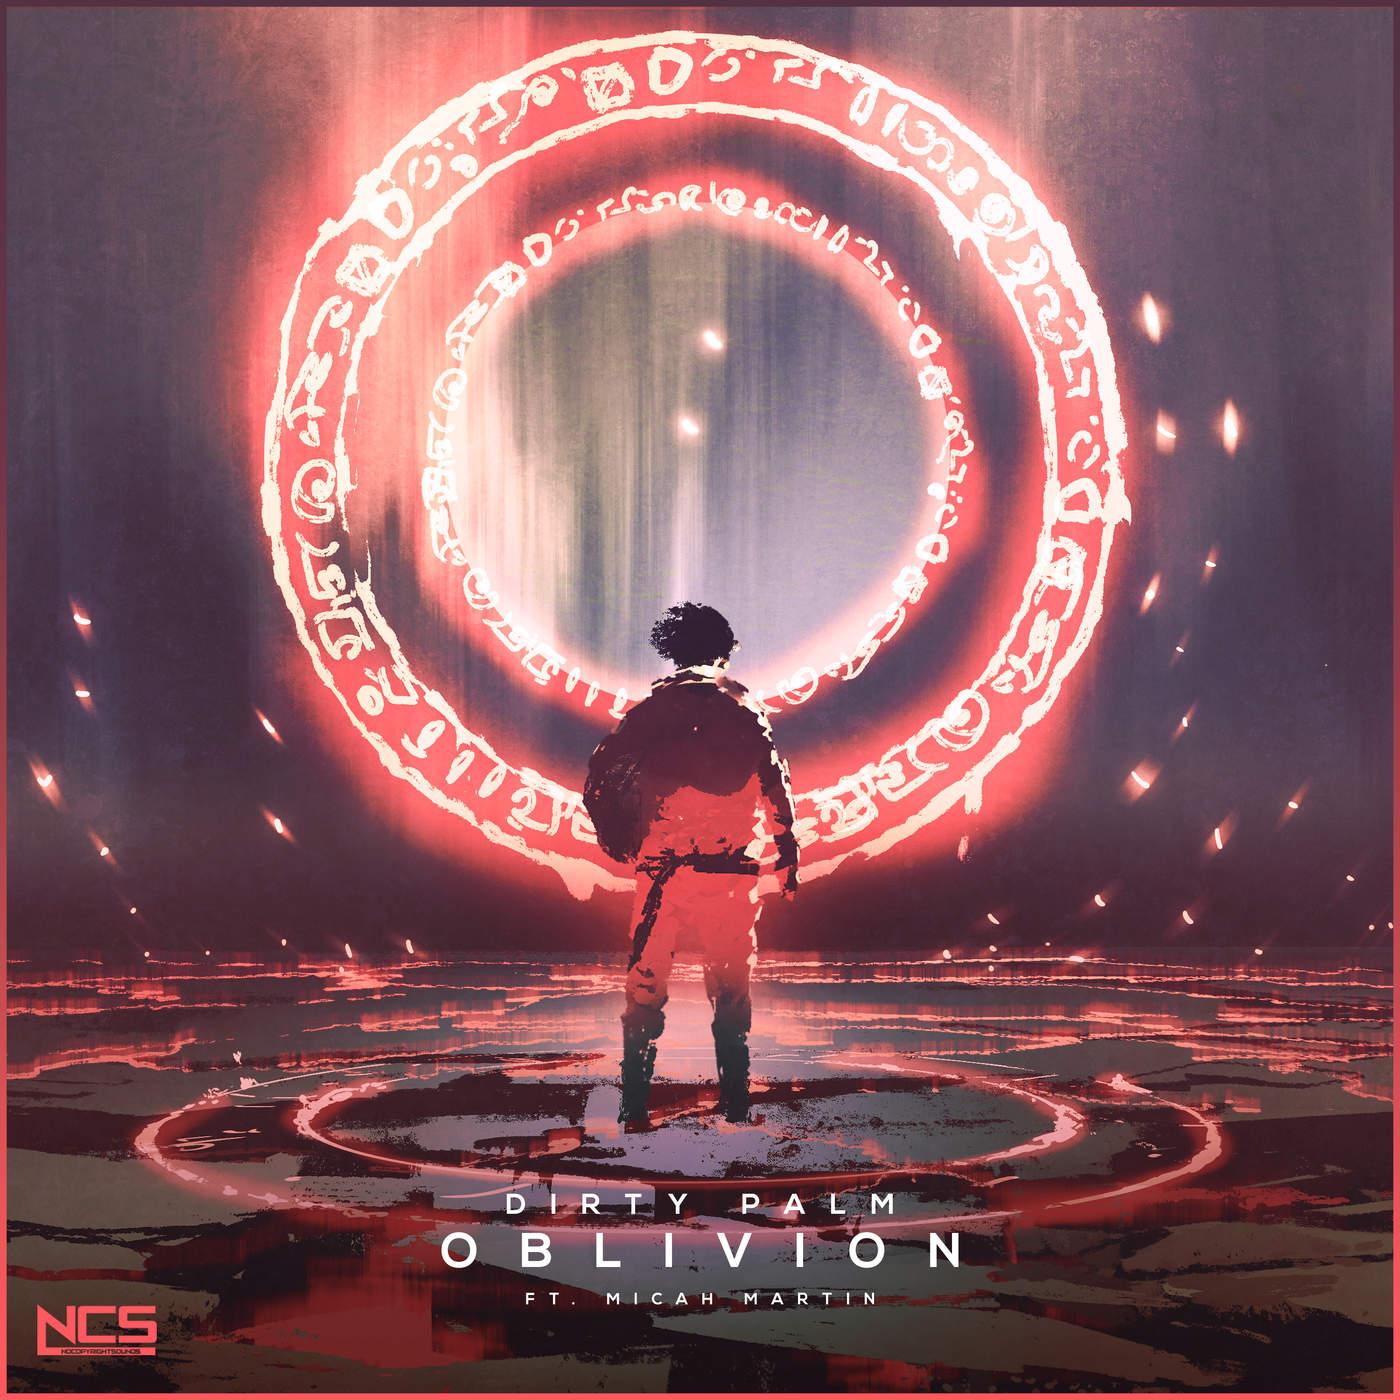 Oblivion (Single) - Dirty Palm - Micah Martin